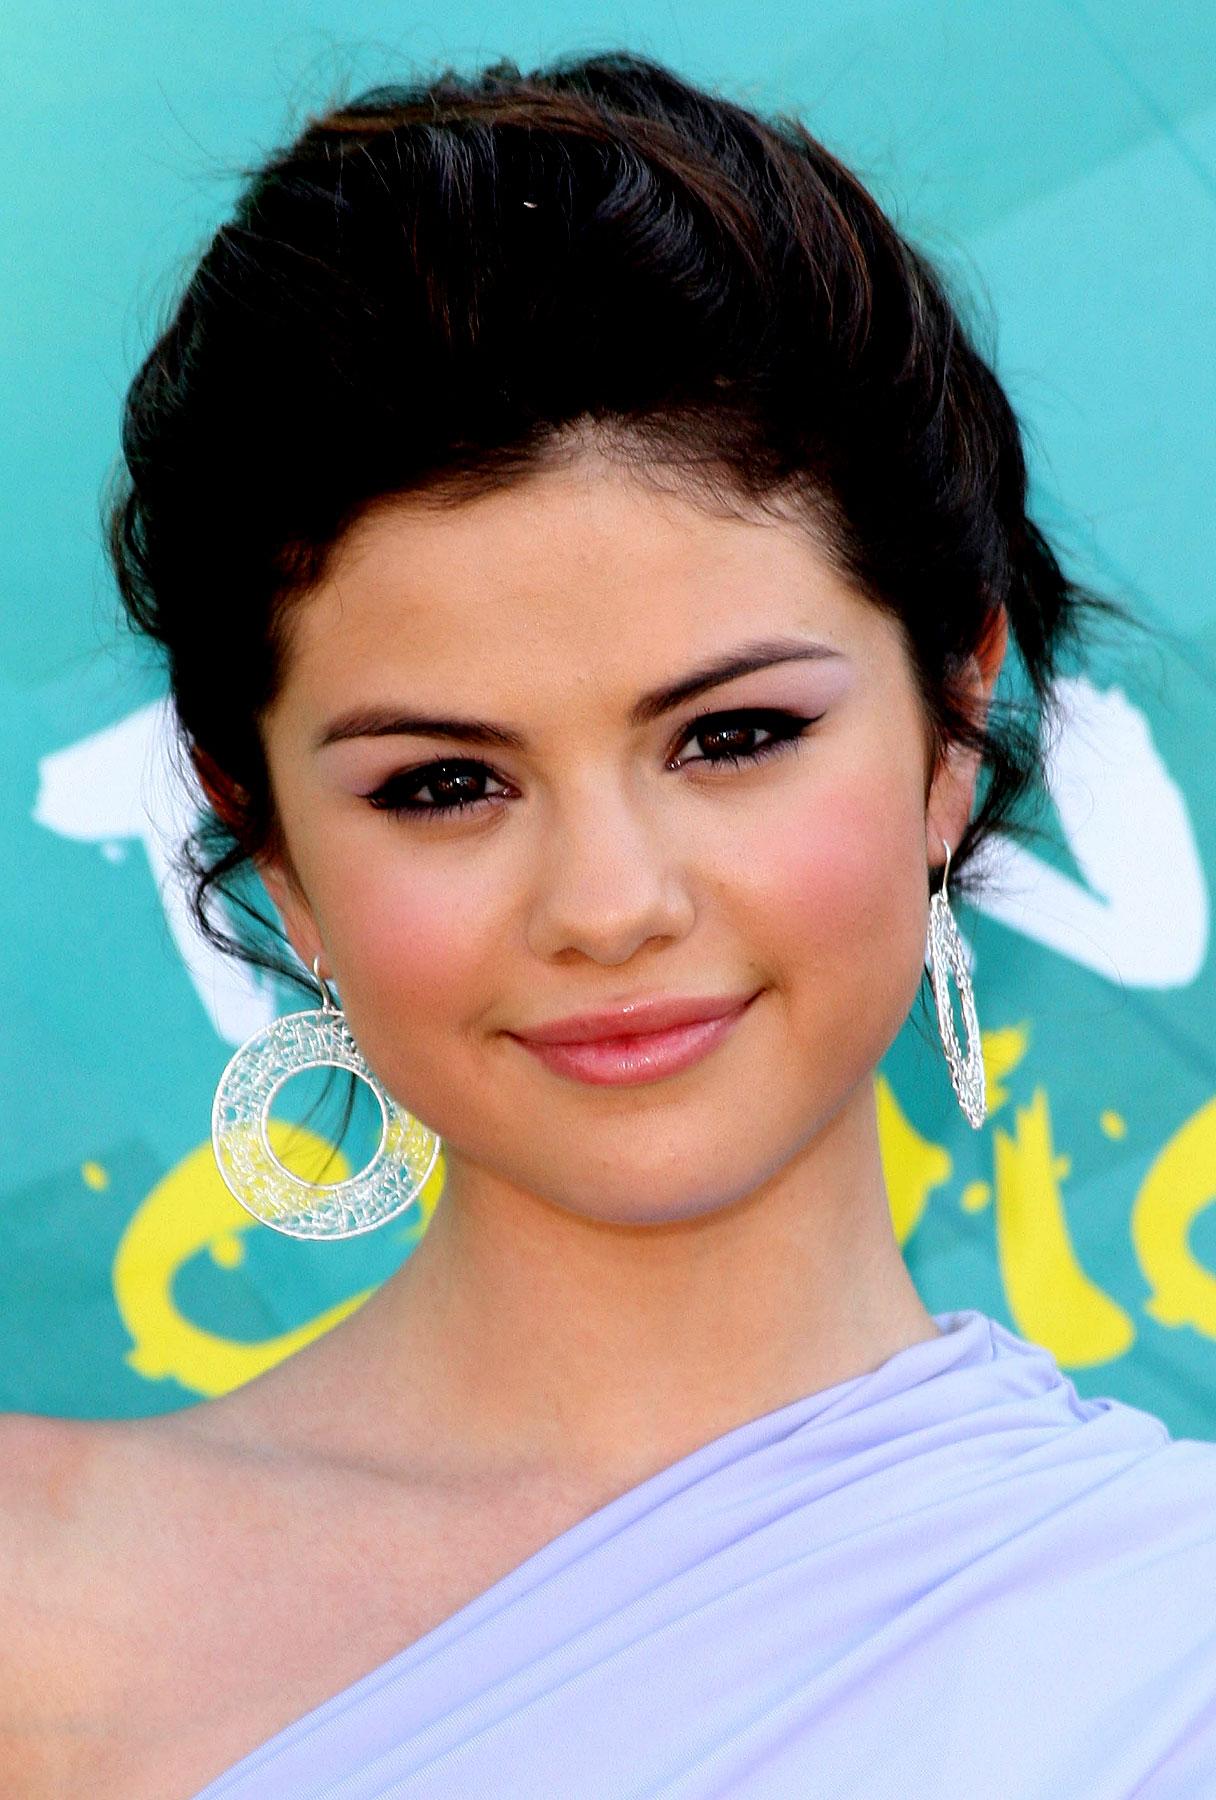 Selena Gomez's Debut Album Is Near!